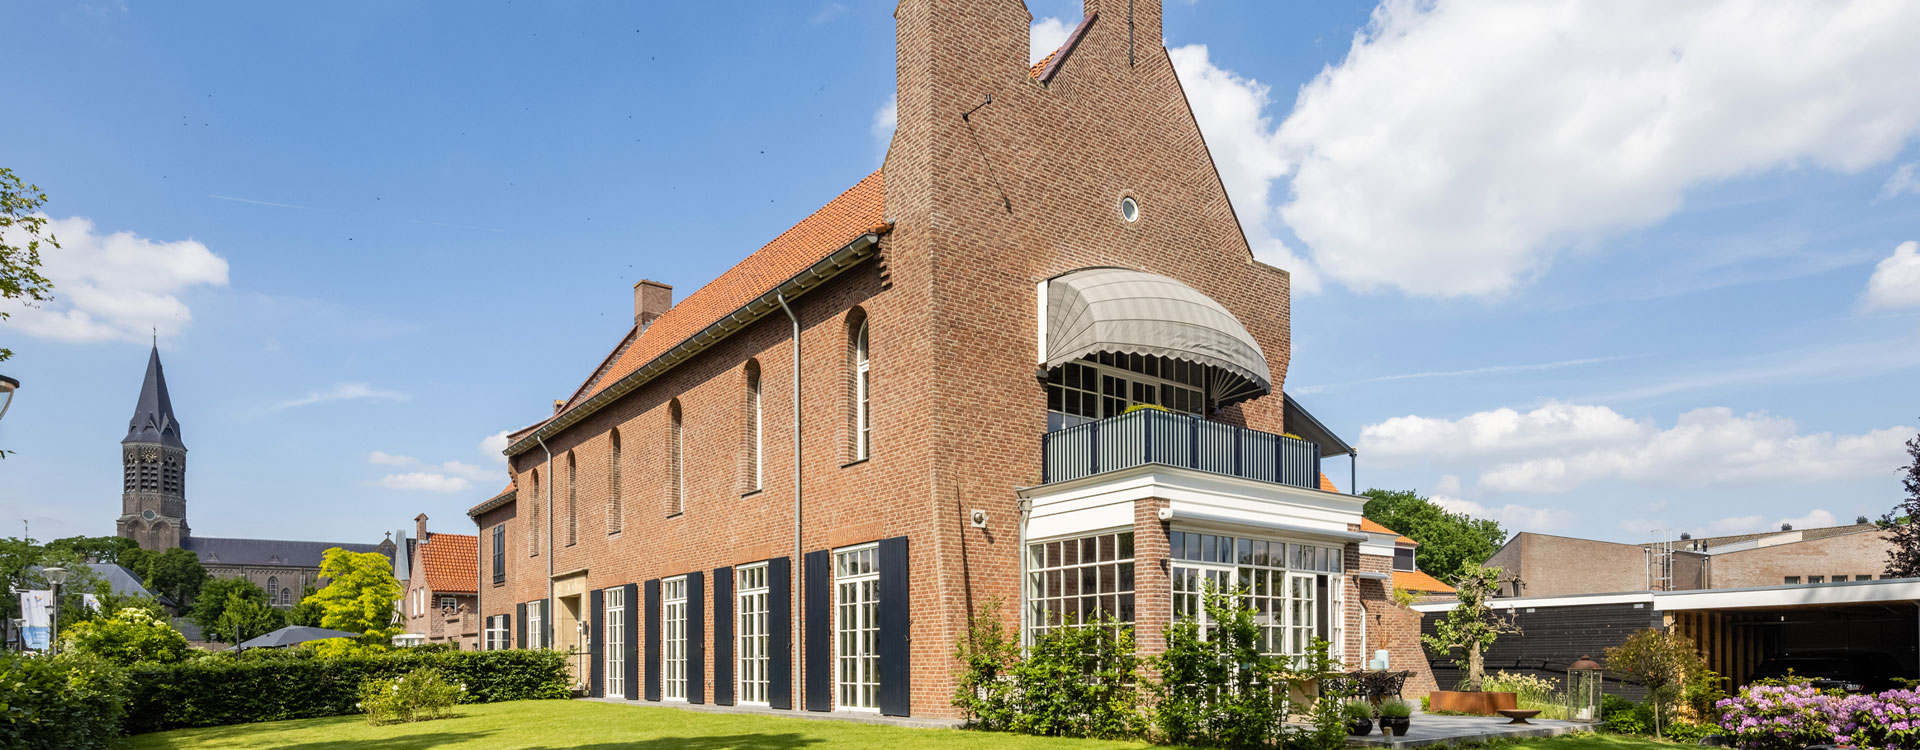 rezidenz-development-eindhoven-de-vank